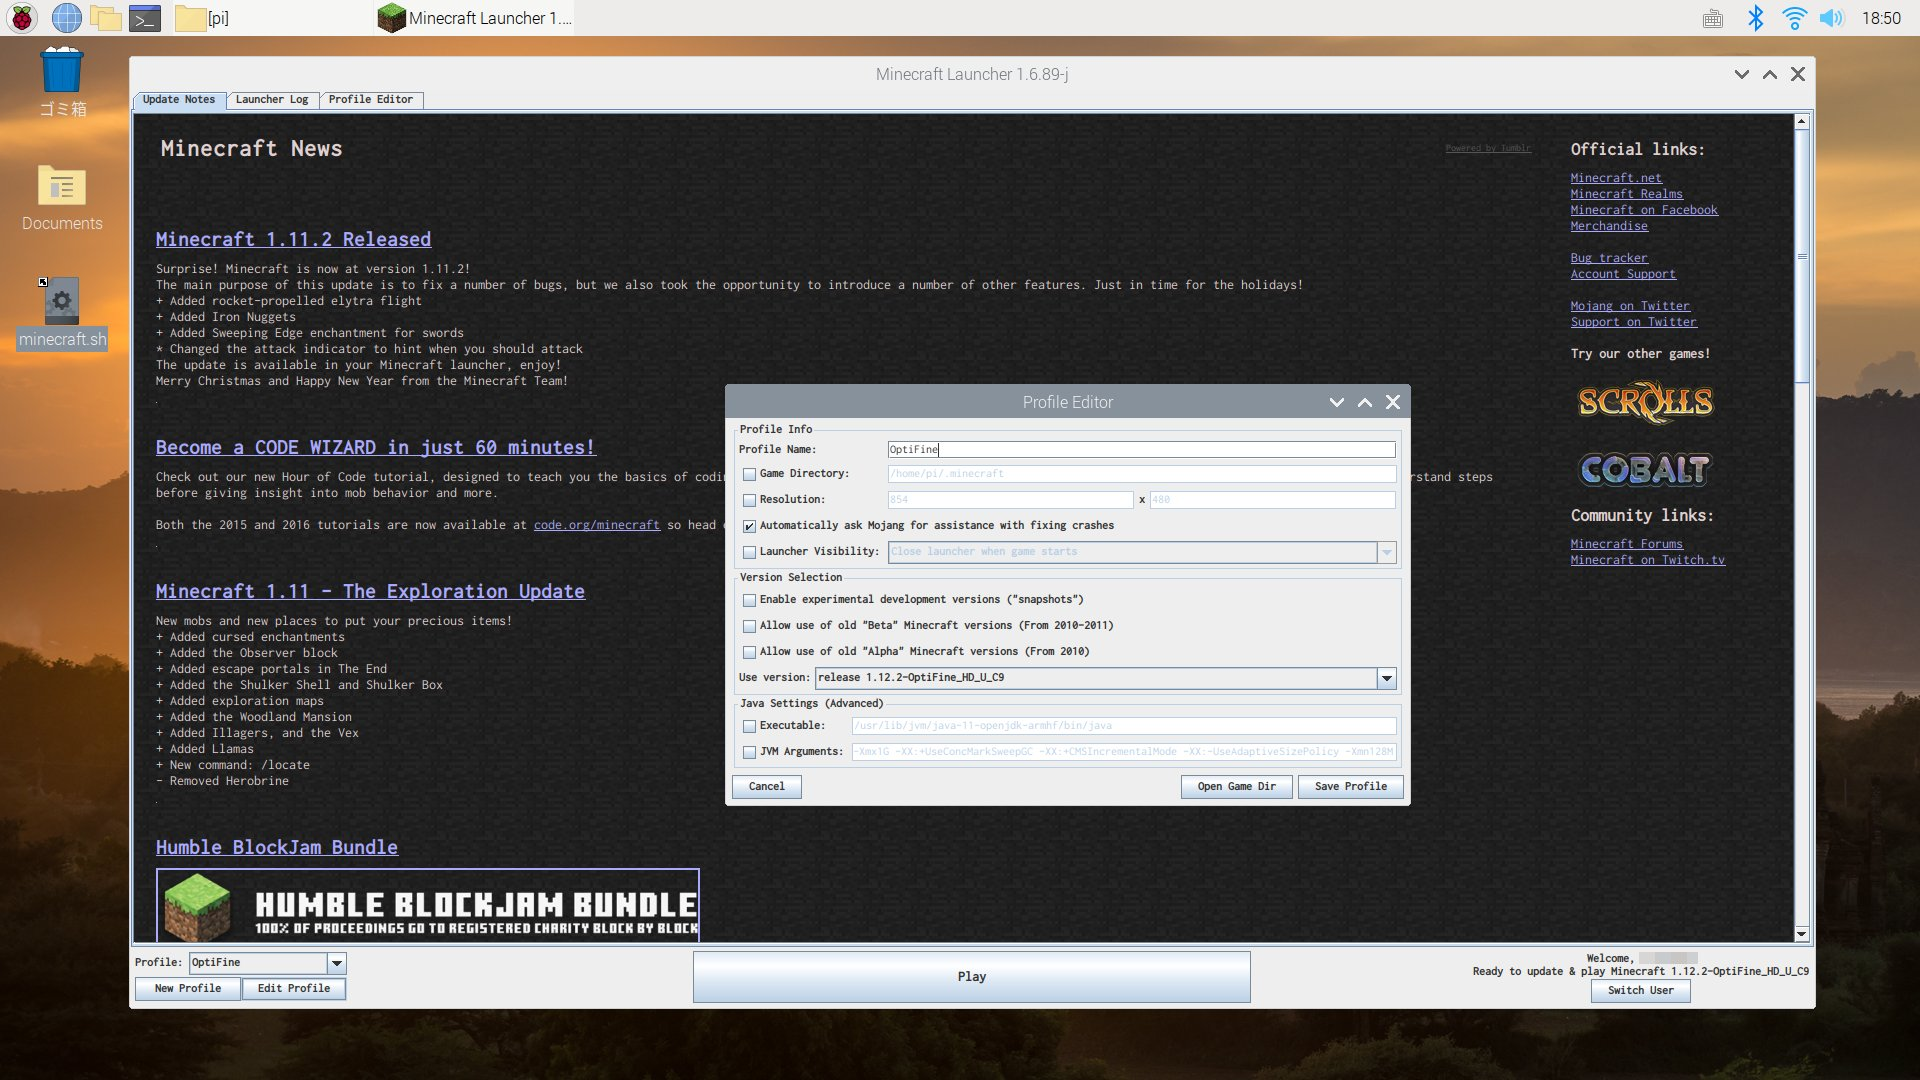 Raspberry Pi 3 Model B + Raspbian GNU/Linux 10 Buster に Minecraft JAVA EDITION をインストール。 https://t.co/ITfdrbpgPU